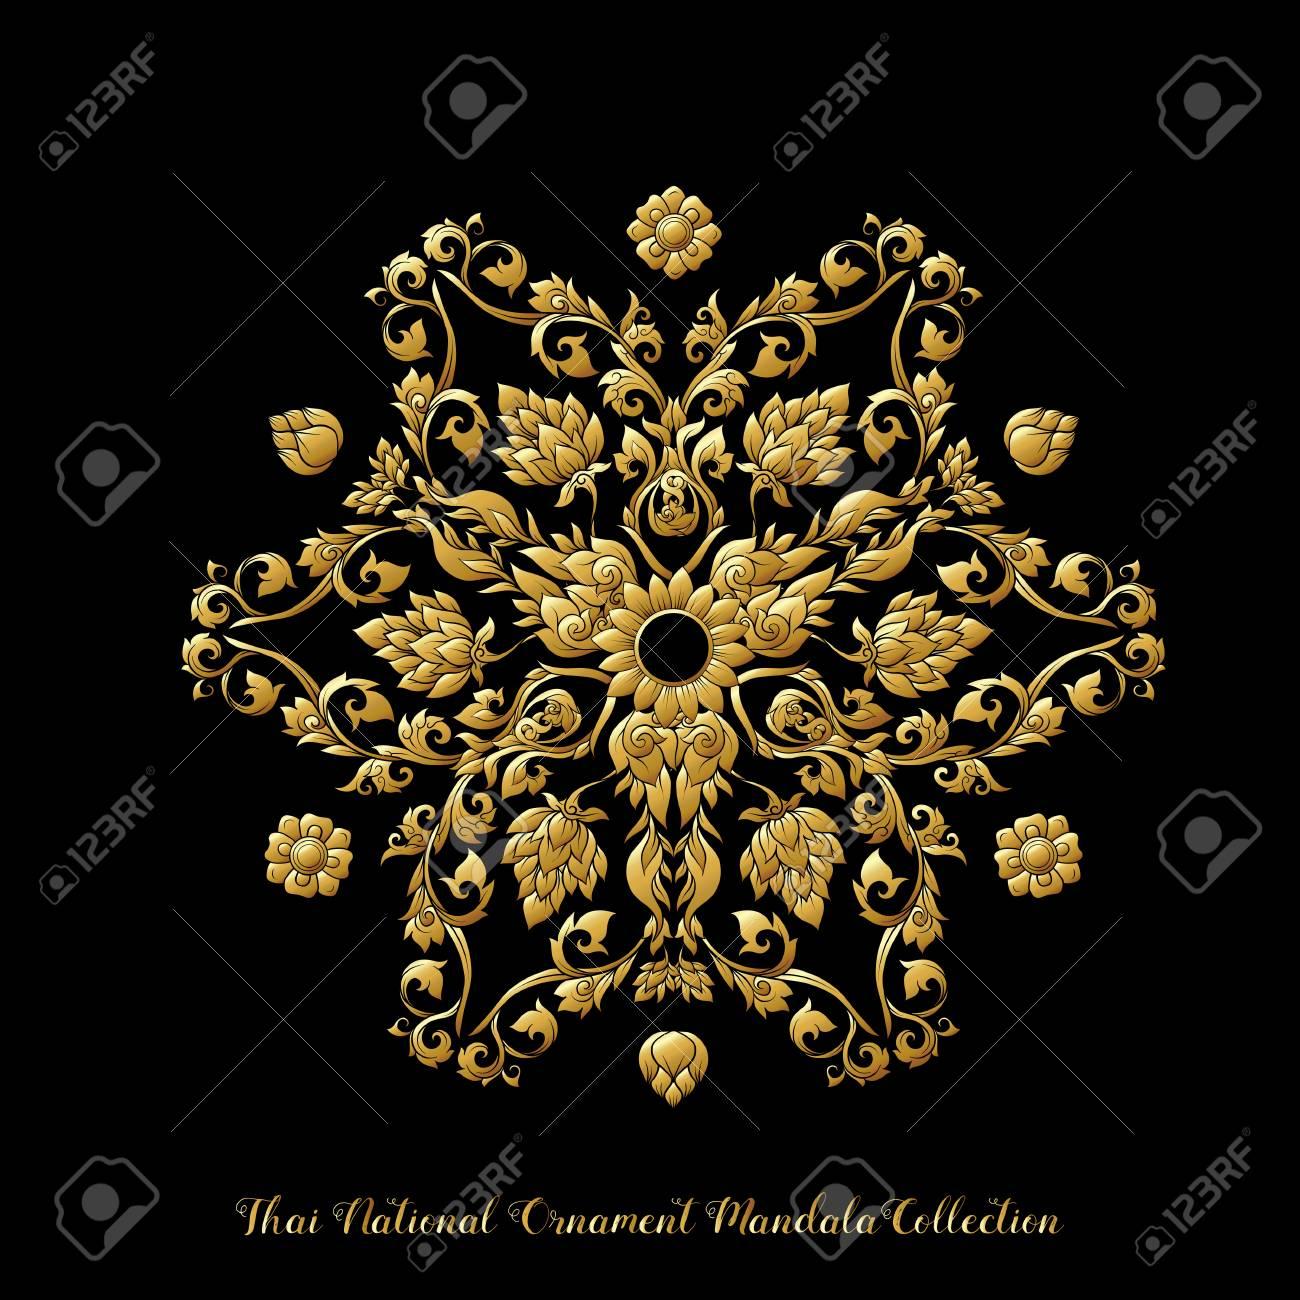 Gold mandala of traditional Thai ornament. Stock illustration. - 106702426